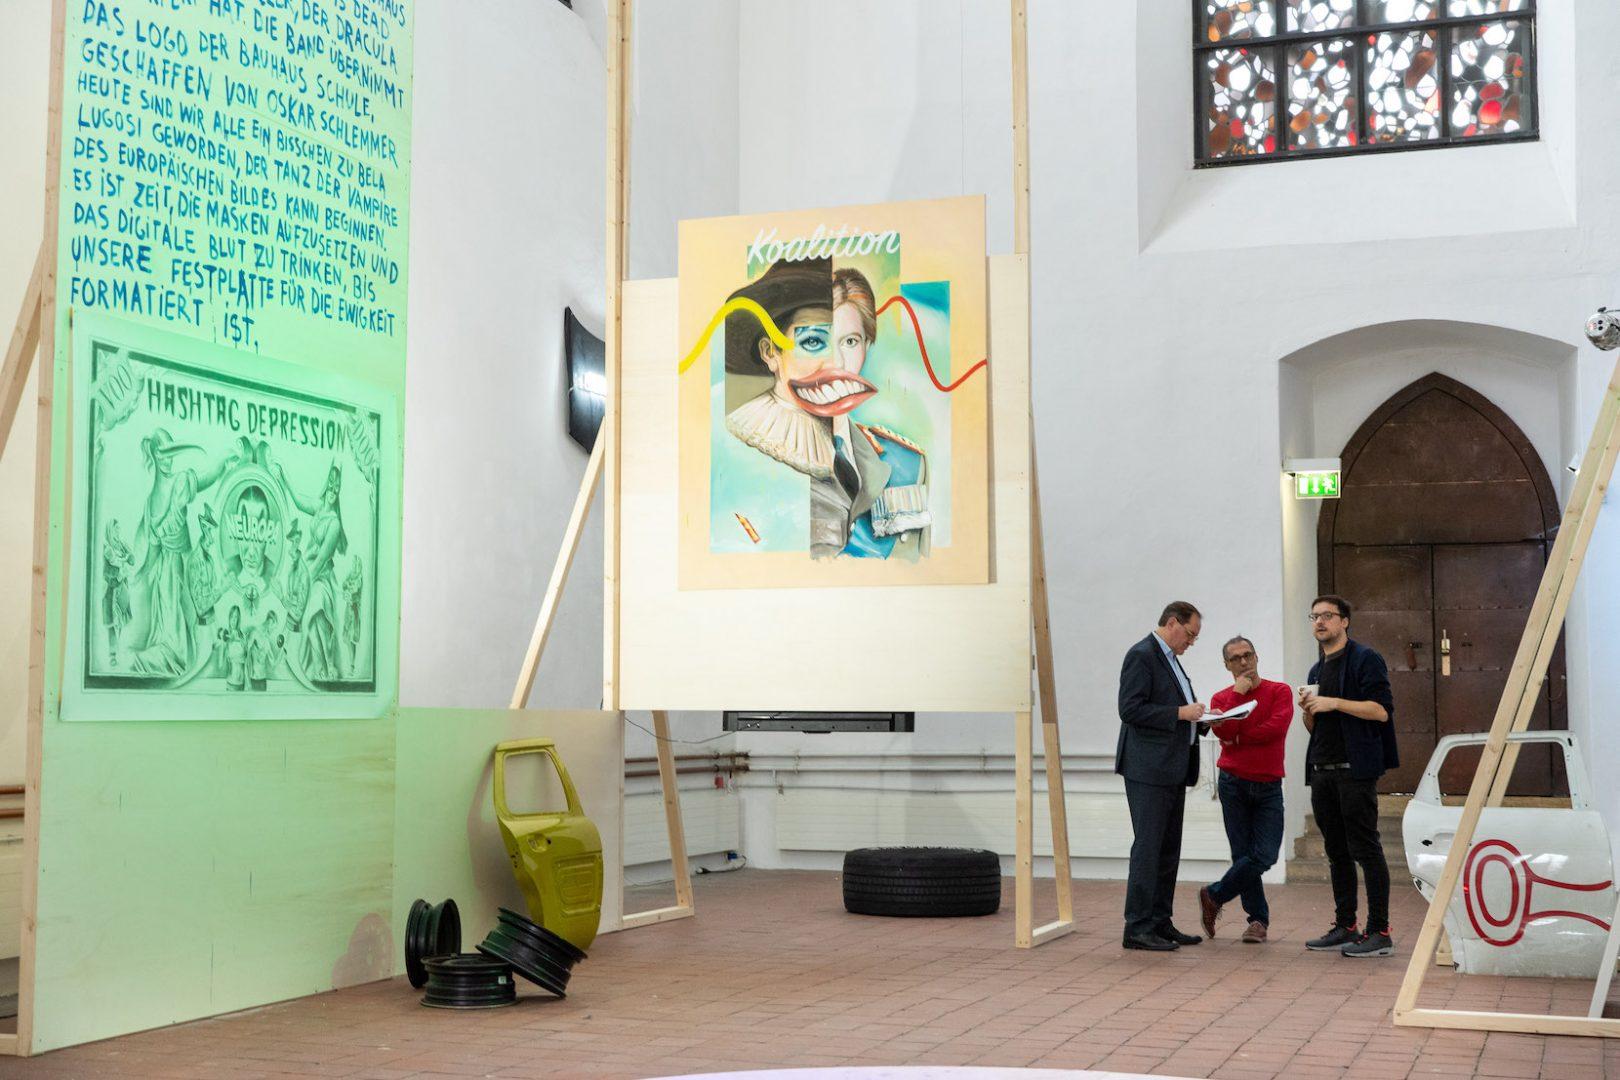 Filip Markiewicz | Celebration Factory, Aperçu de l'Exposition, Kunsthalle Osnabrück, 2019/20. Photo: Avec la permission de Friso Gentsch / Kunsthalle Osnabrück